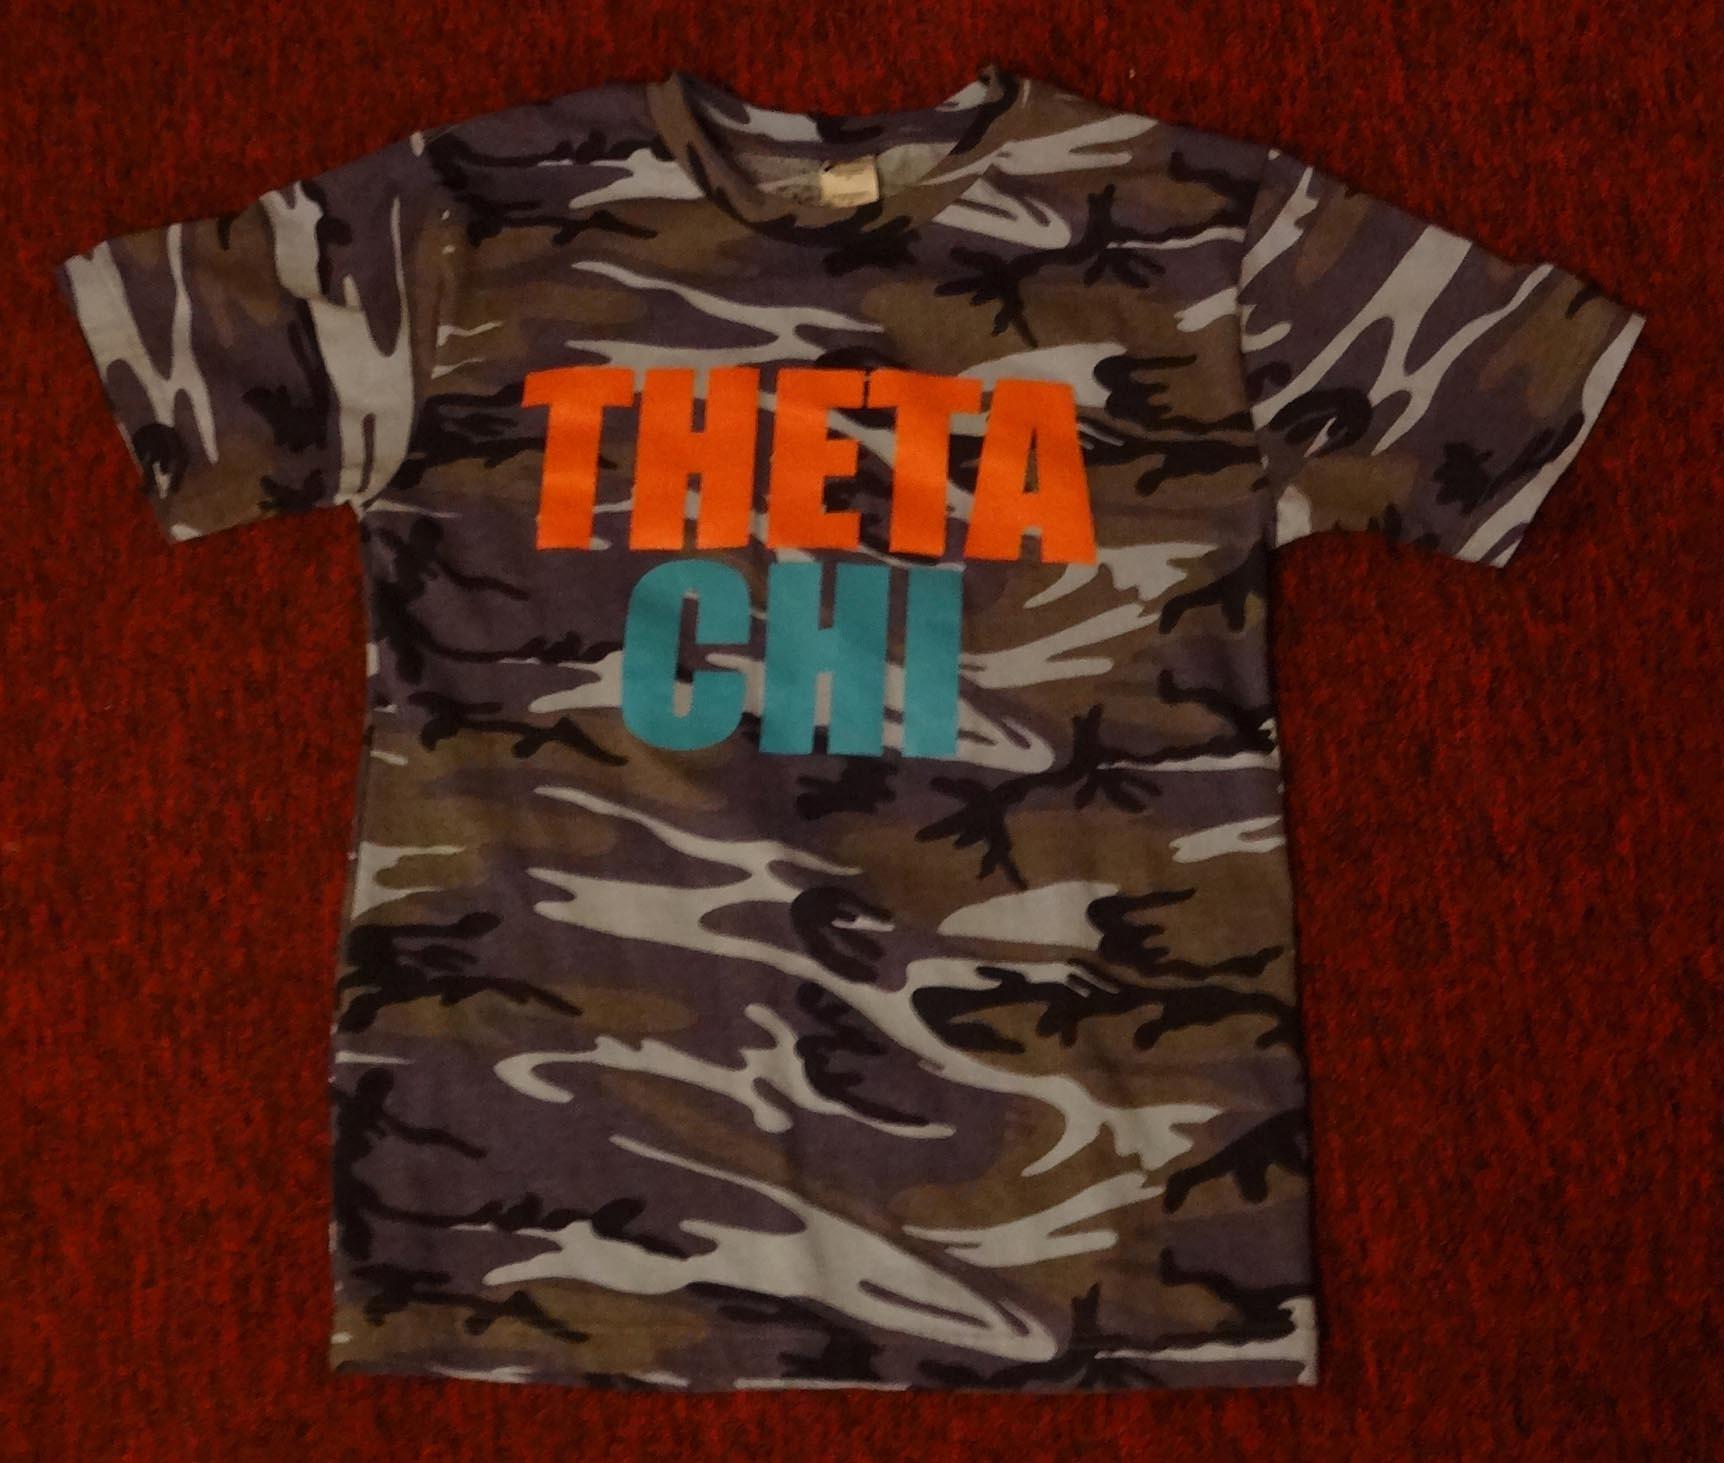 2014 THON T-Shirt (Front) - Feb. 22, 2014